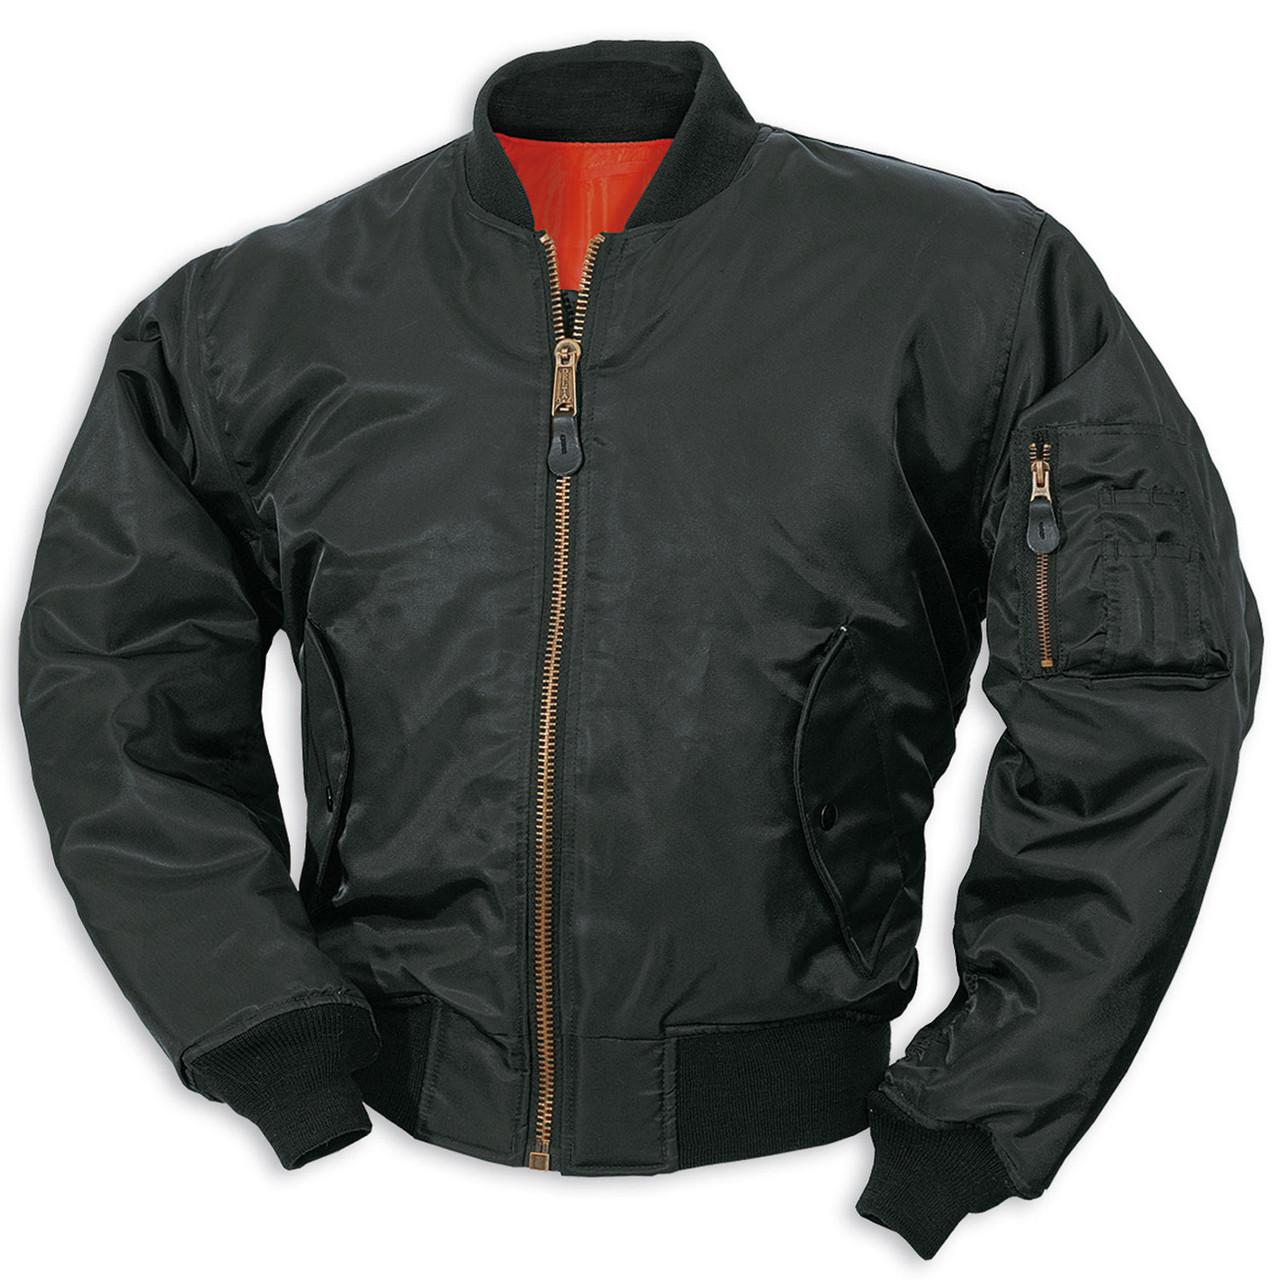 Куртка мужская летная МА1 США черная Mil-Tec